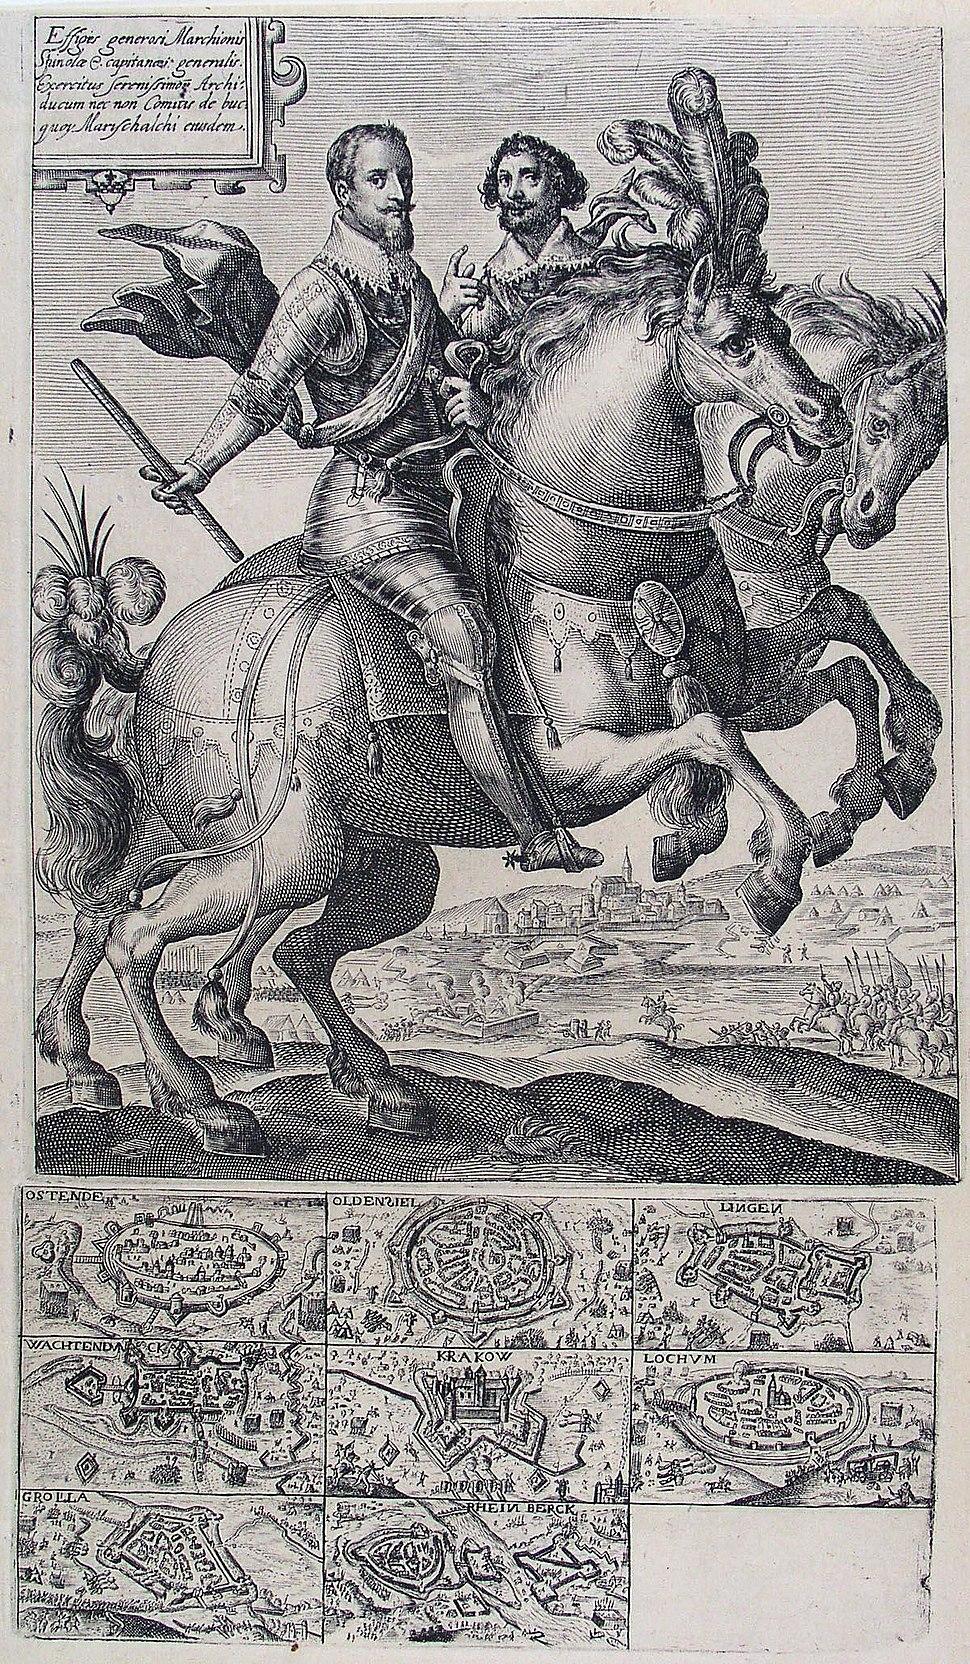 Conquests of Ambrosio Spinola (Crispijn van der Passe I)